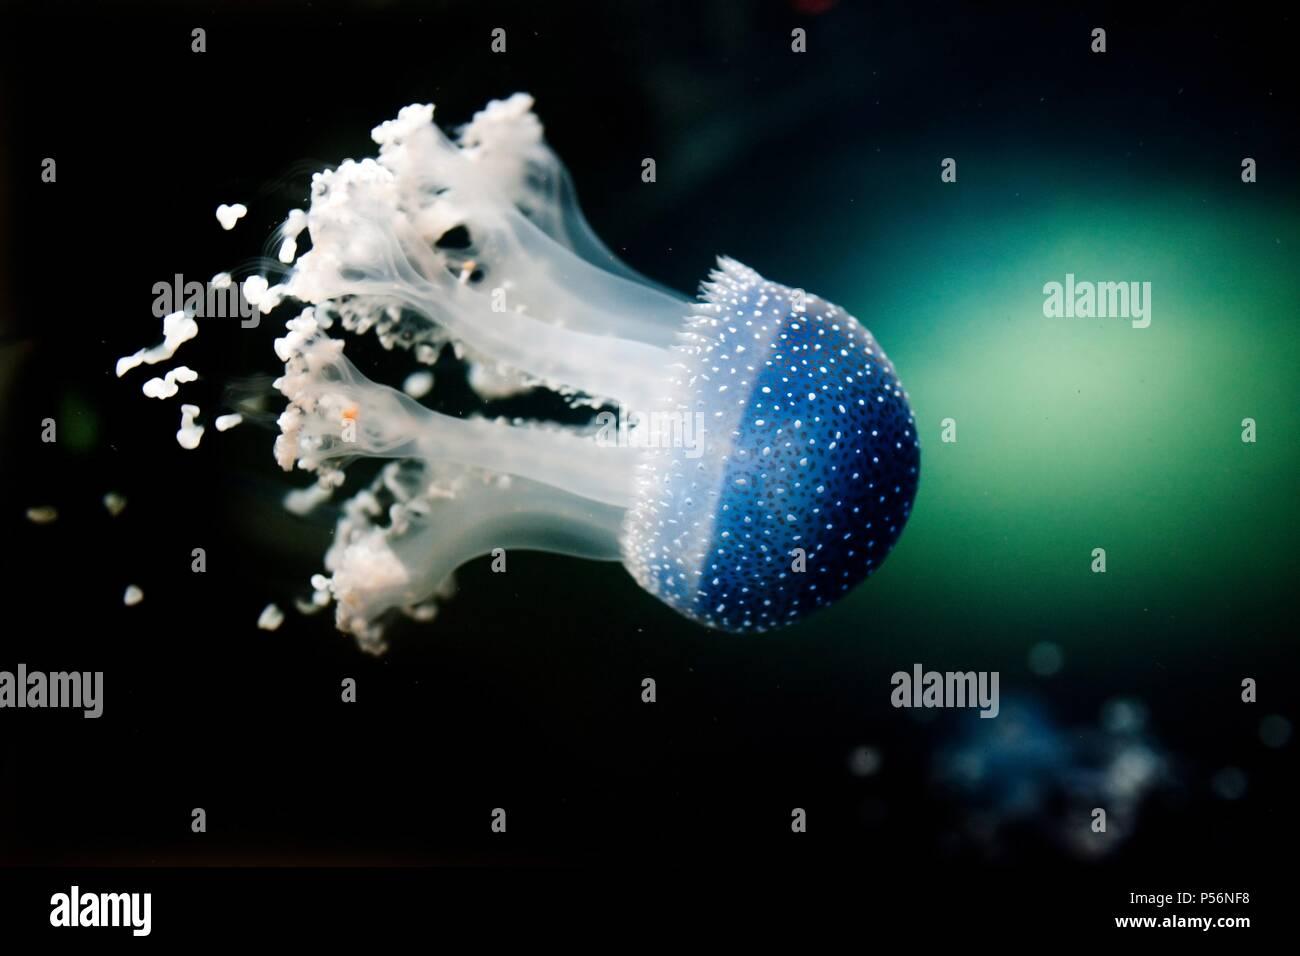 jellyfish - Stock Image